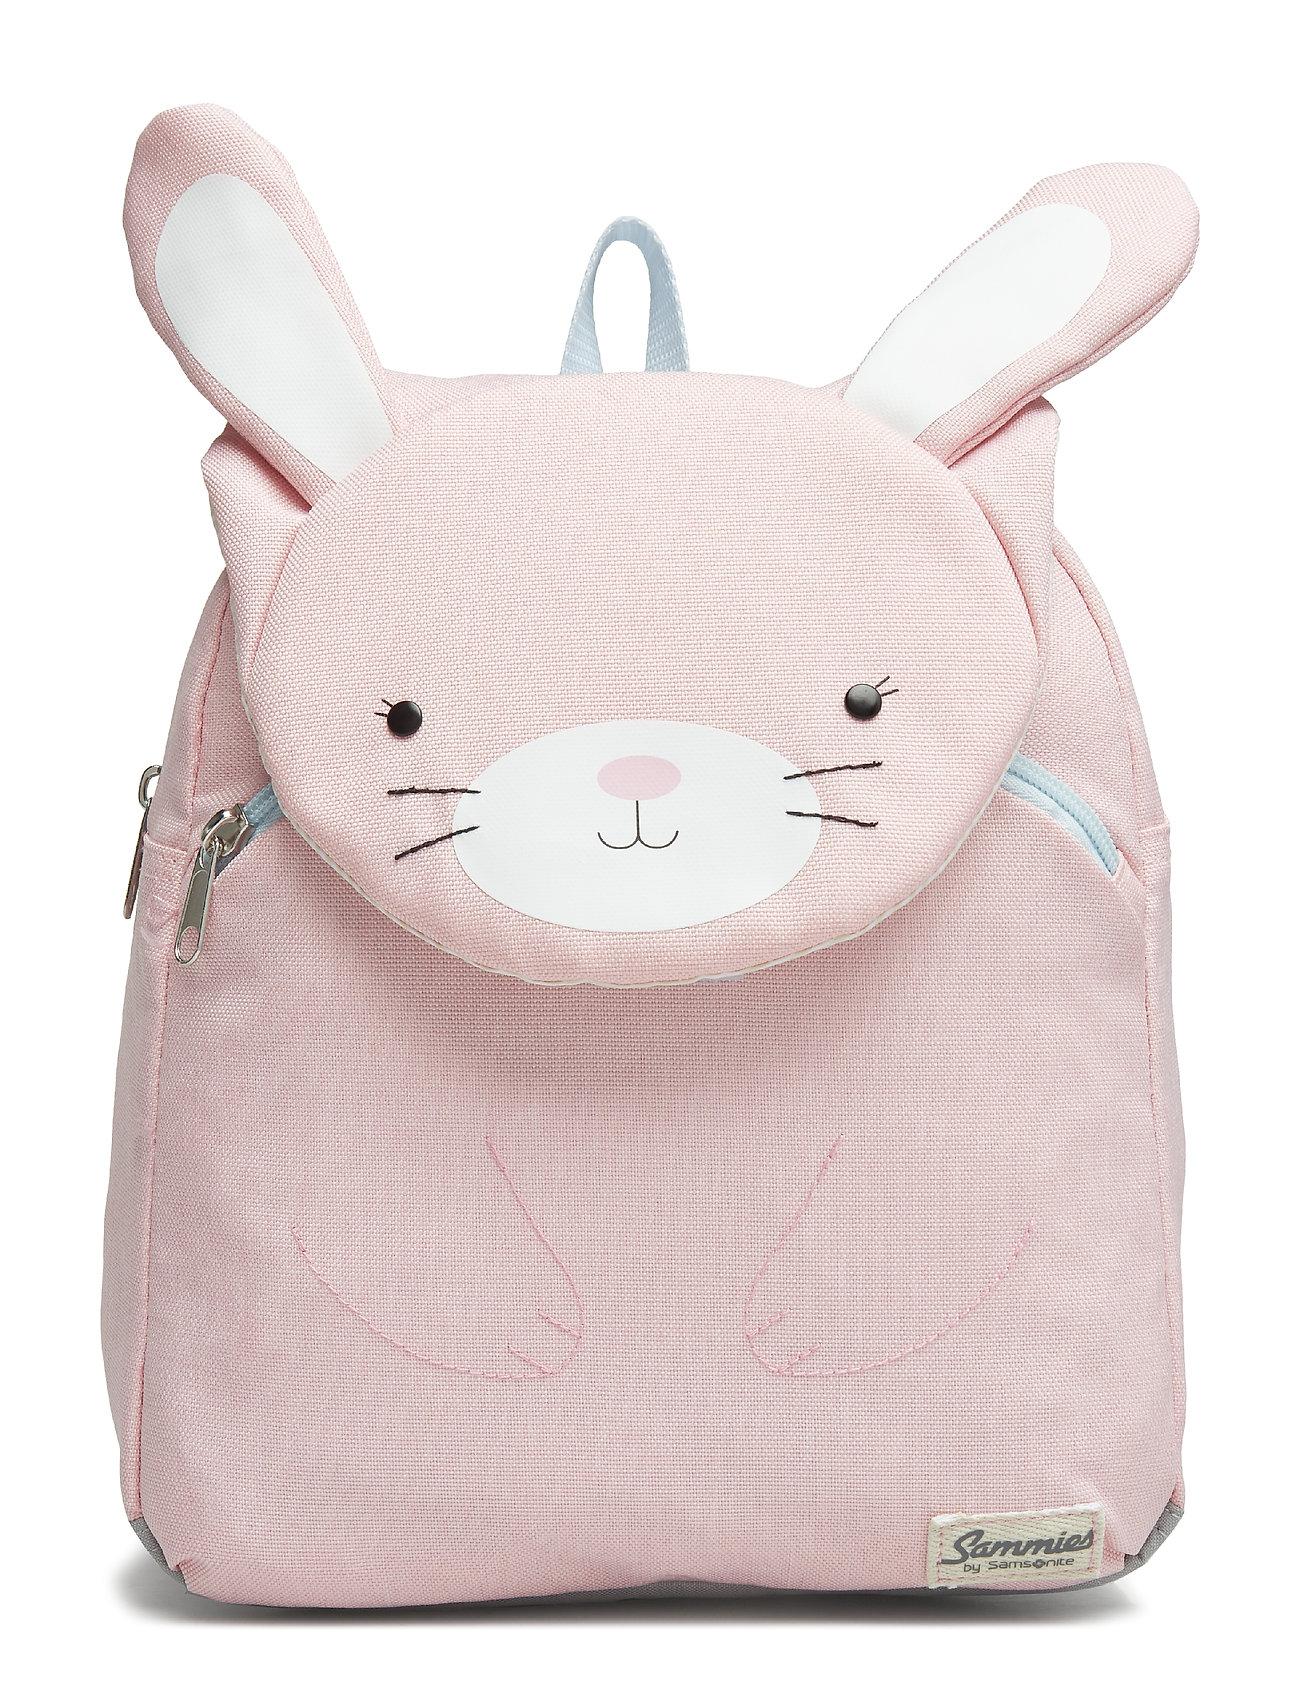 Samsonite Happy Sammies Backpack S Rabbit Rosie - RABBIT ROSIE